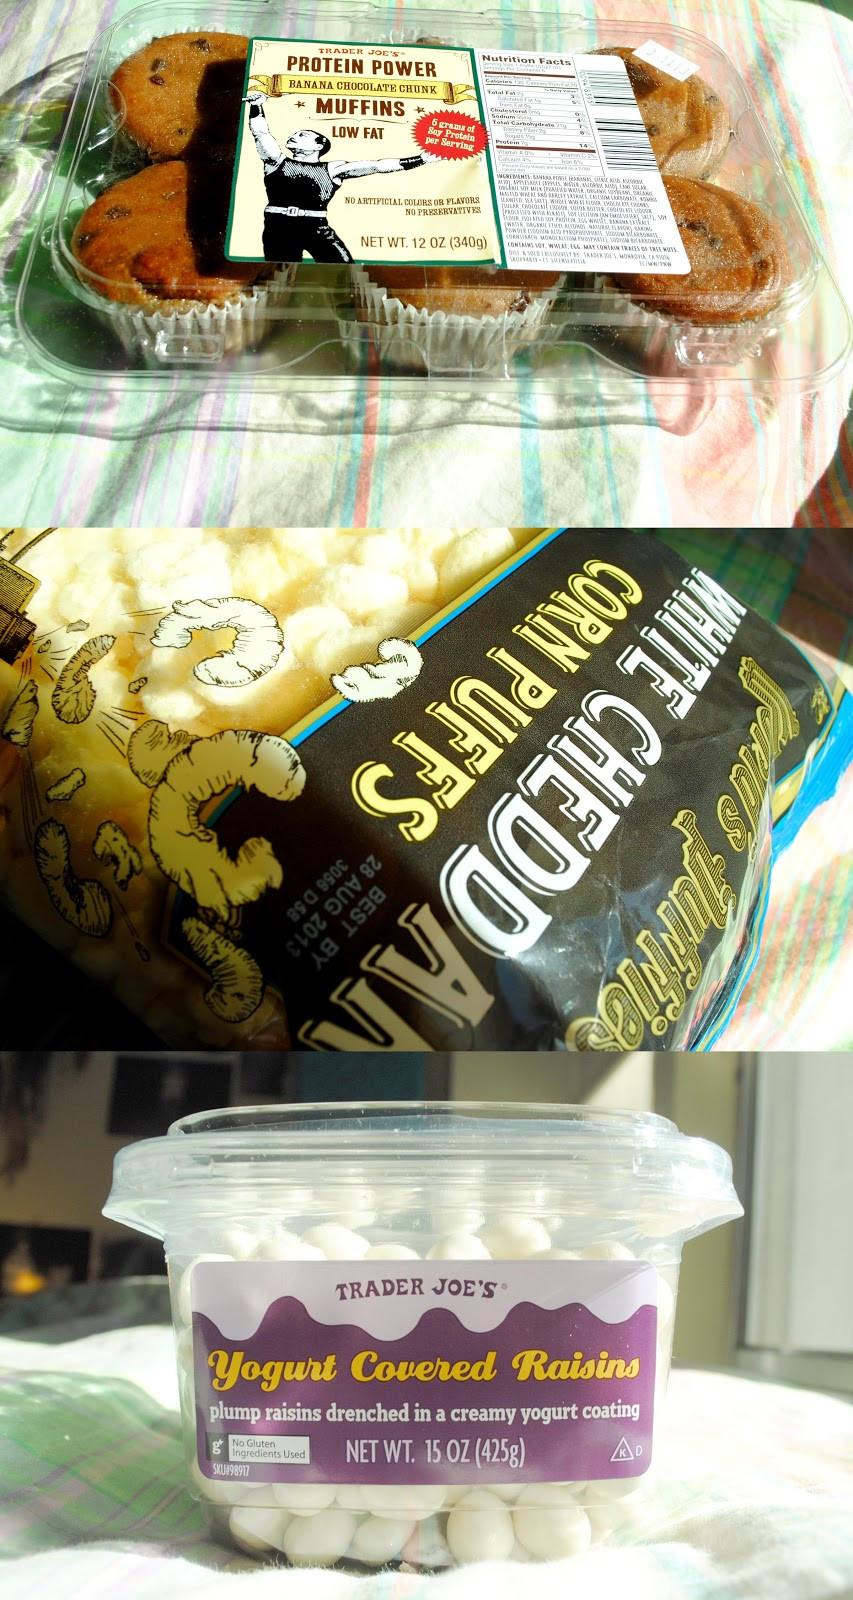 Healthy Trader Joes Snacks  Three Healthy Snacks From Trader Joe s ELITEbyLK